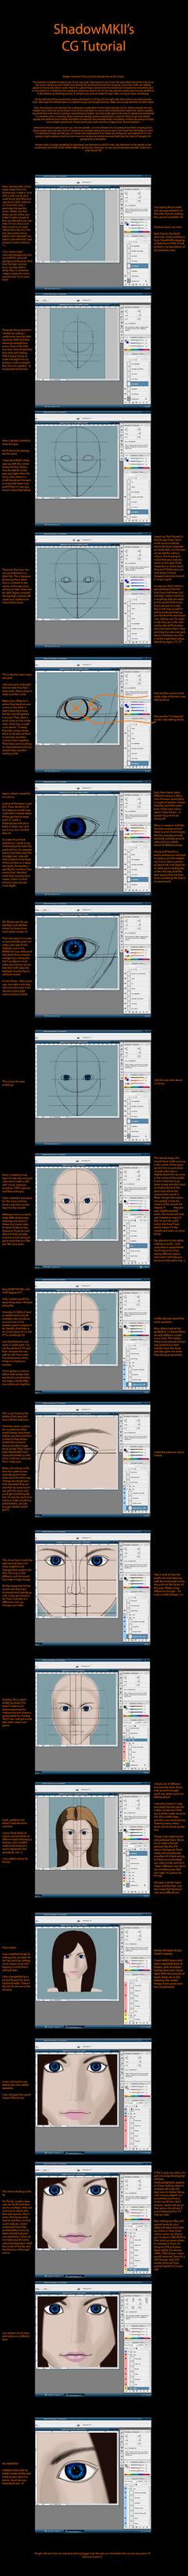 CG Tutorial - Part I by ShadowMKII